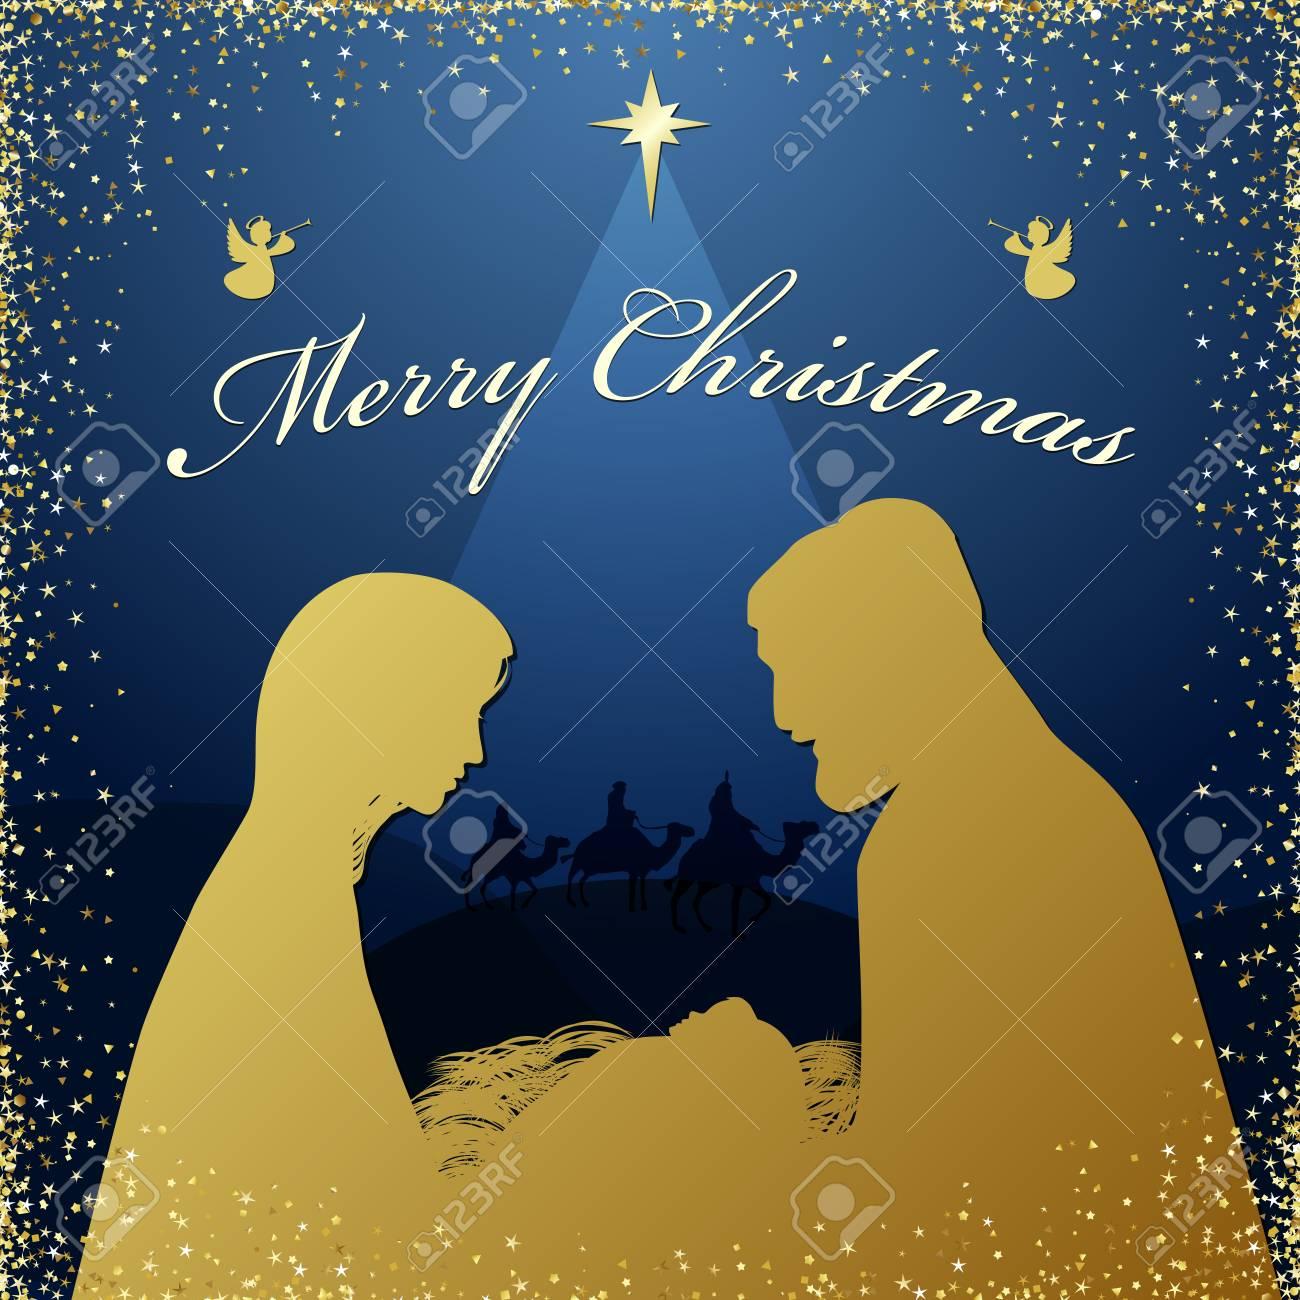 Christmas Religious.Merry Christmas Religious Greeting Son Of God Was Born Of Spiritual